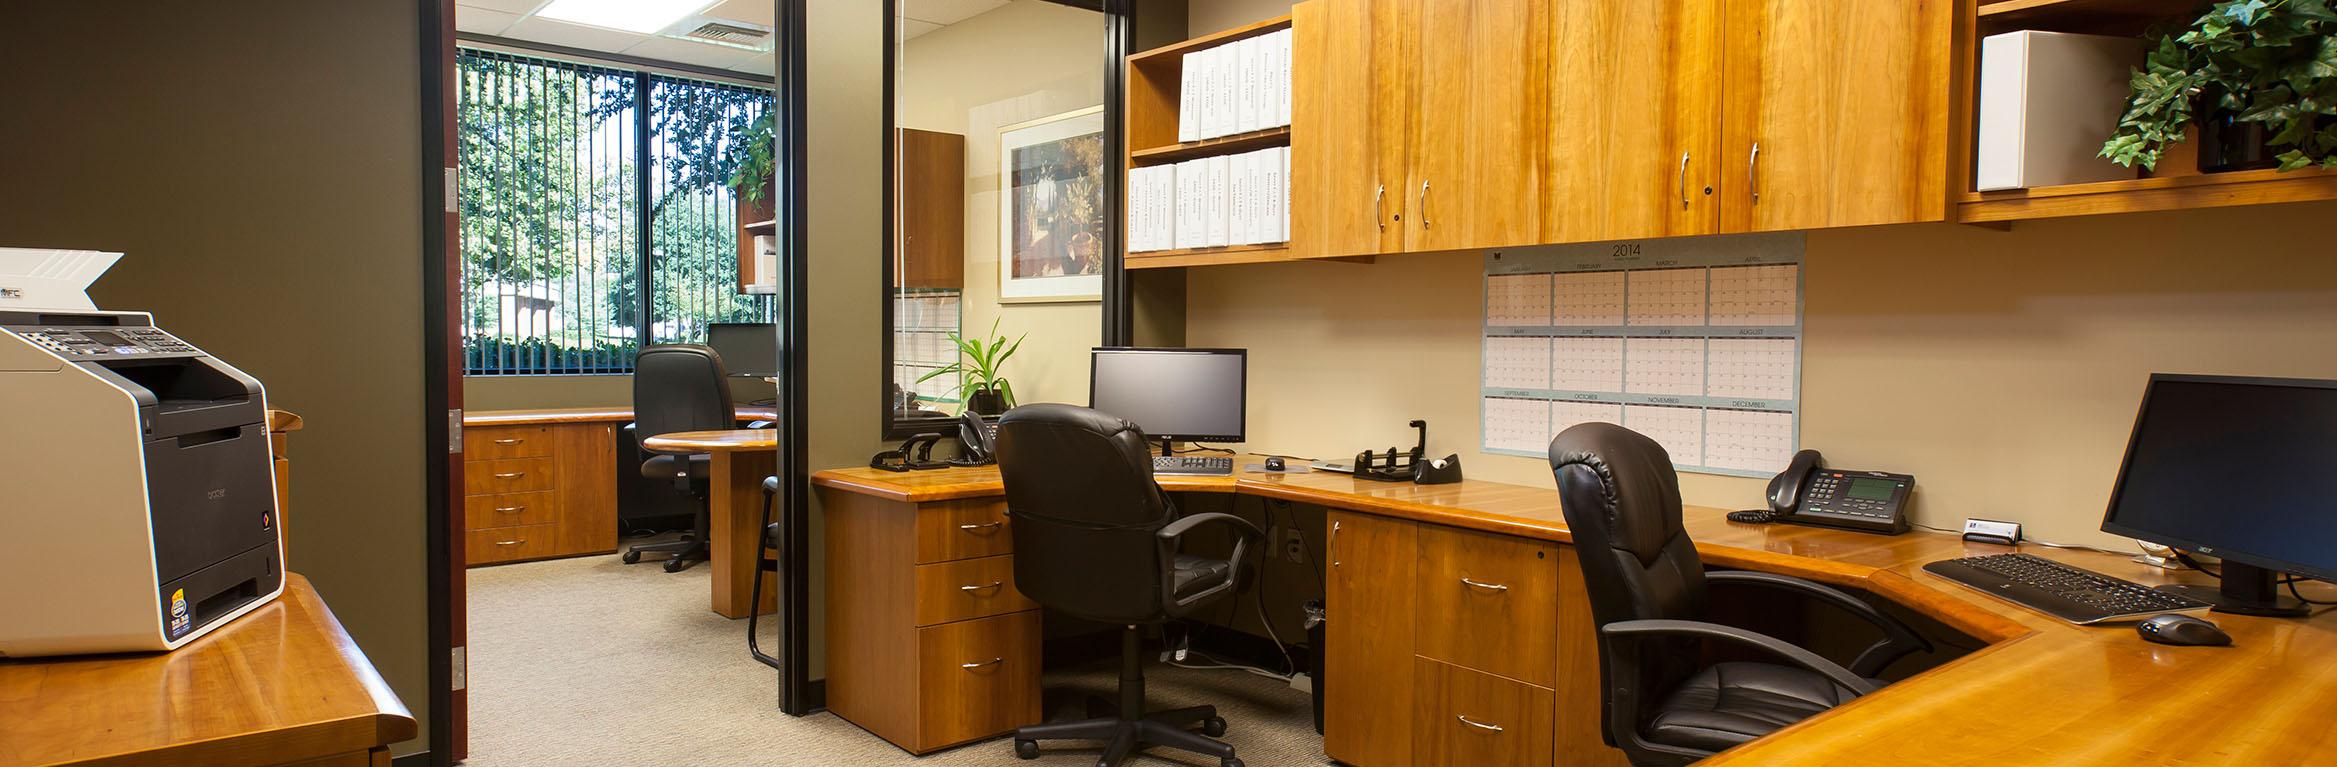 Small Office Space in Sacramento, CA